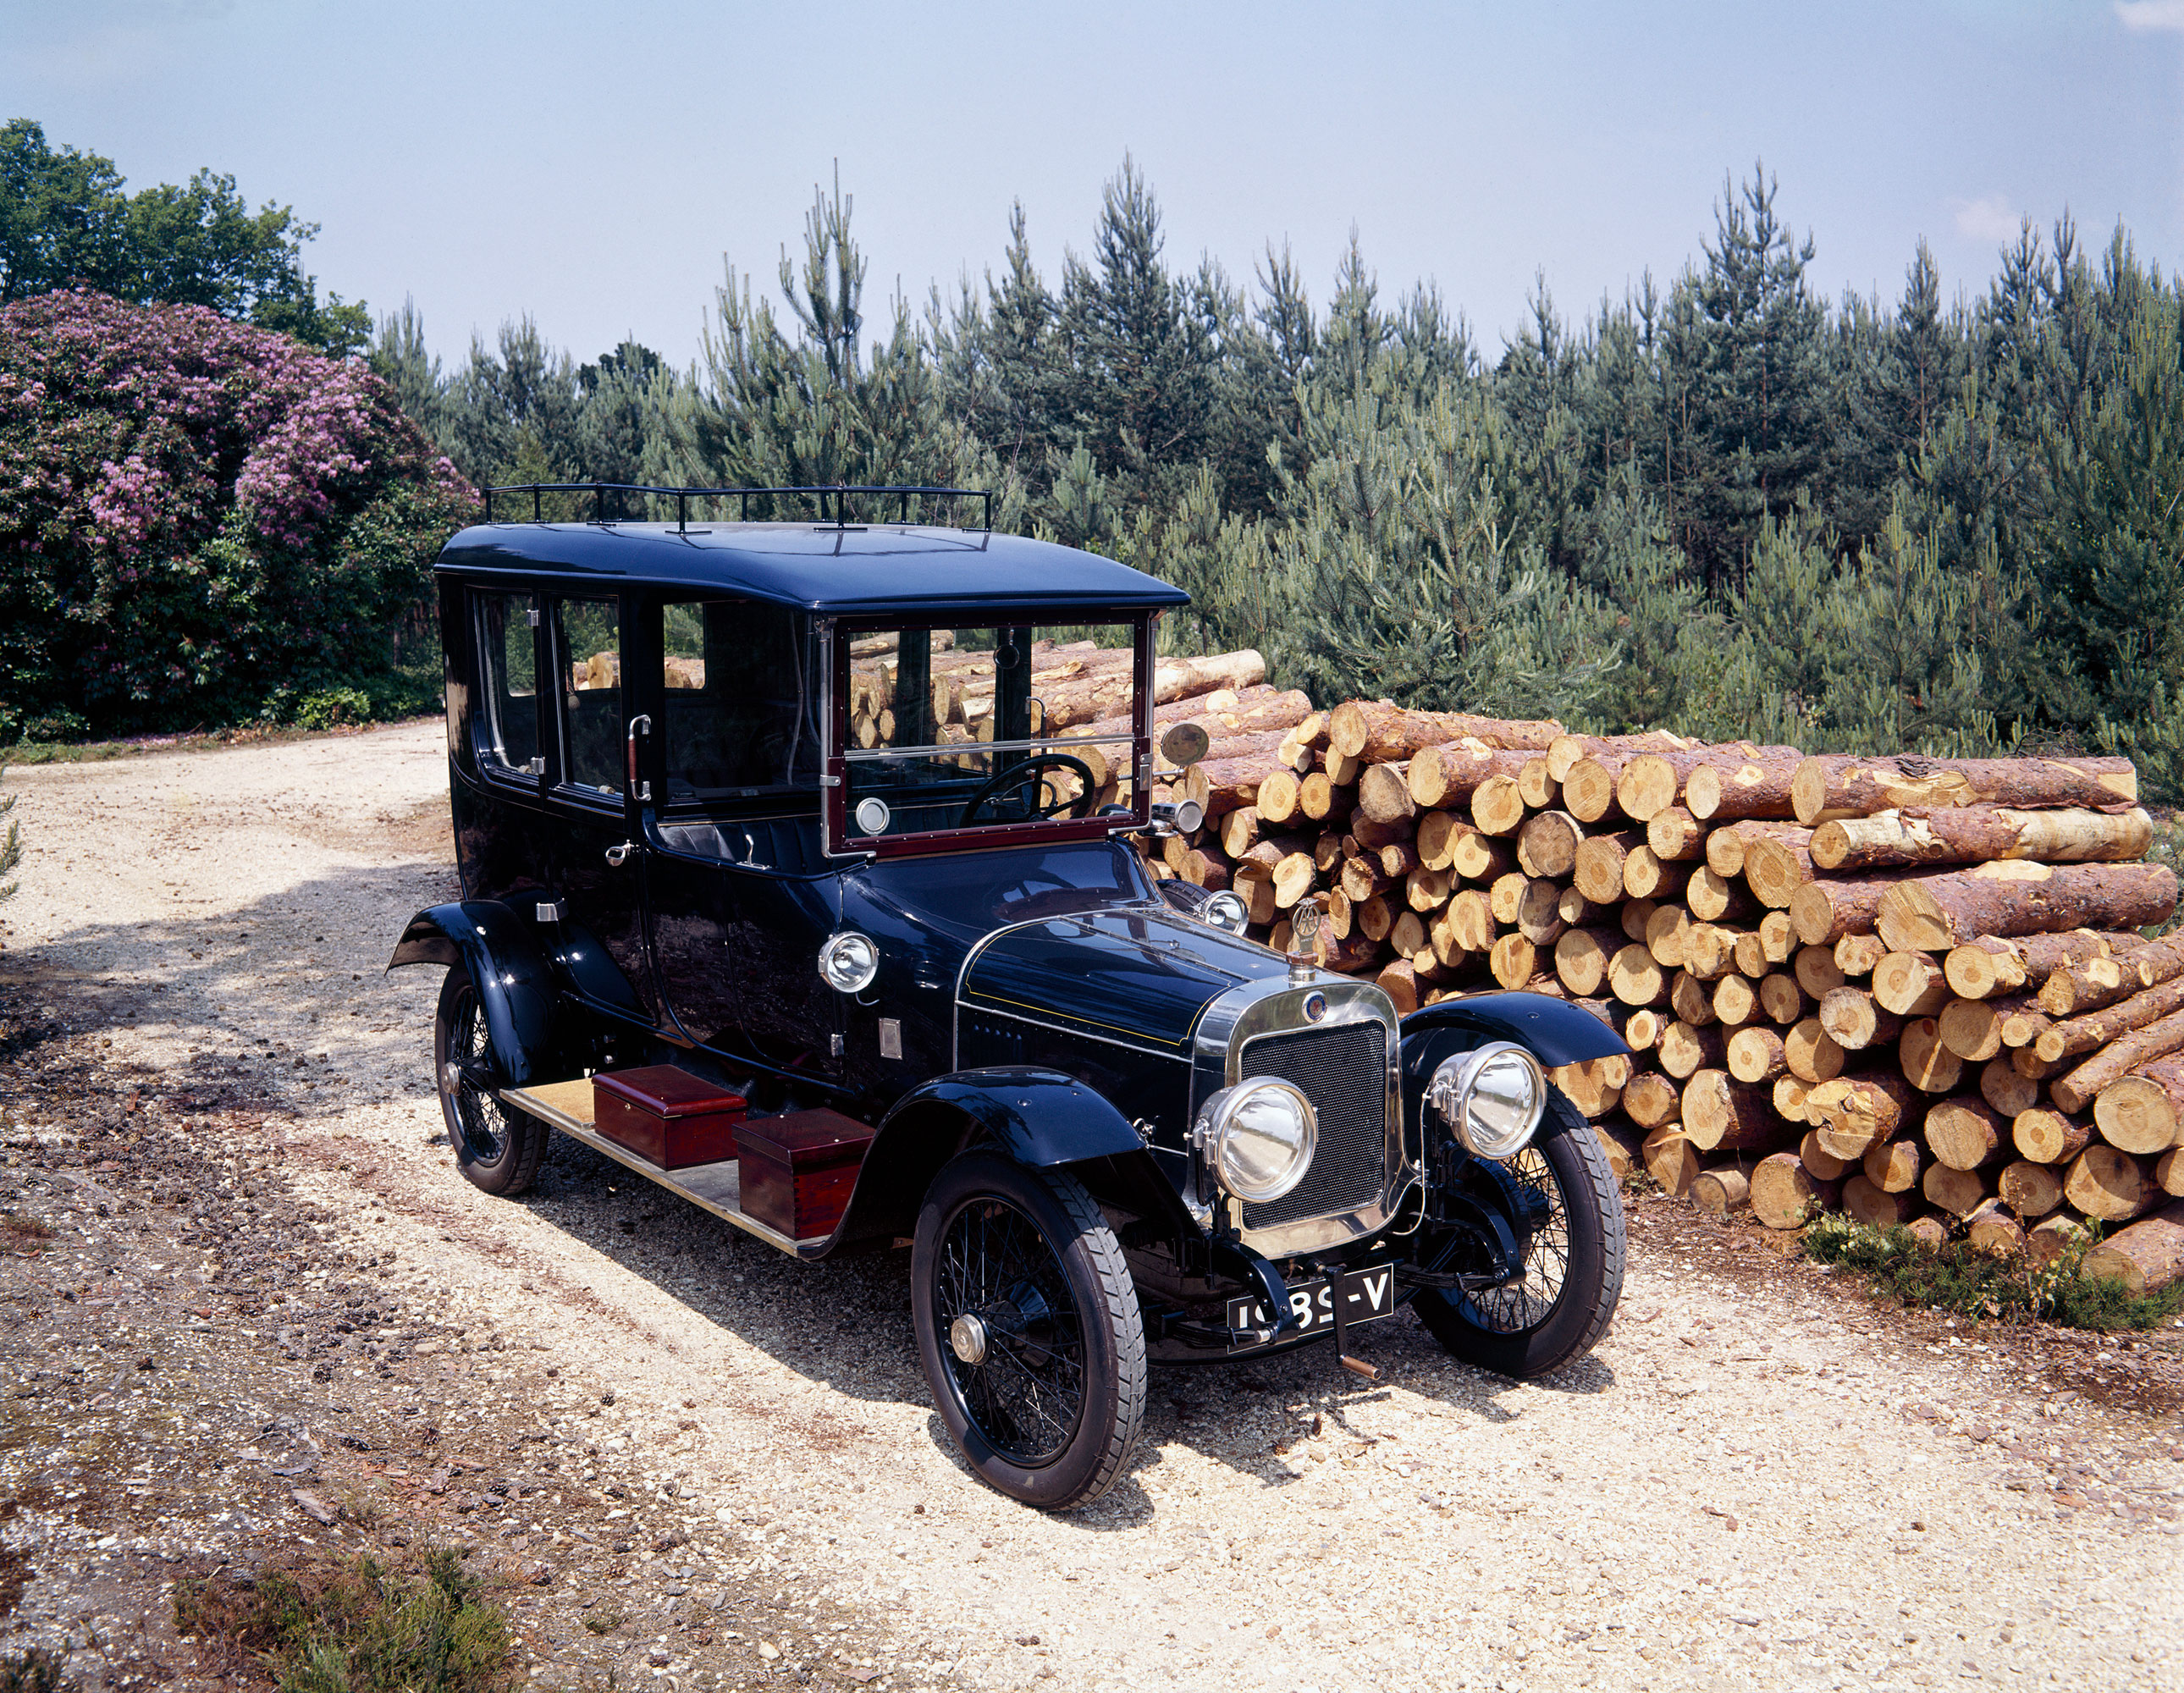 A 1913 Argyll 15/30hp Edwardian car